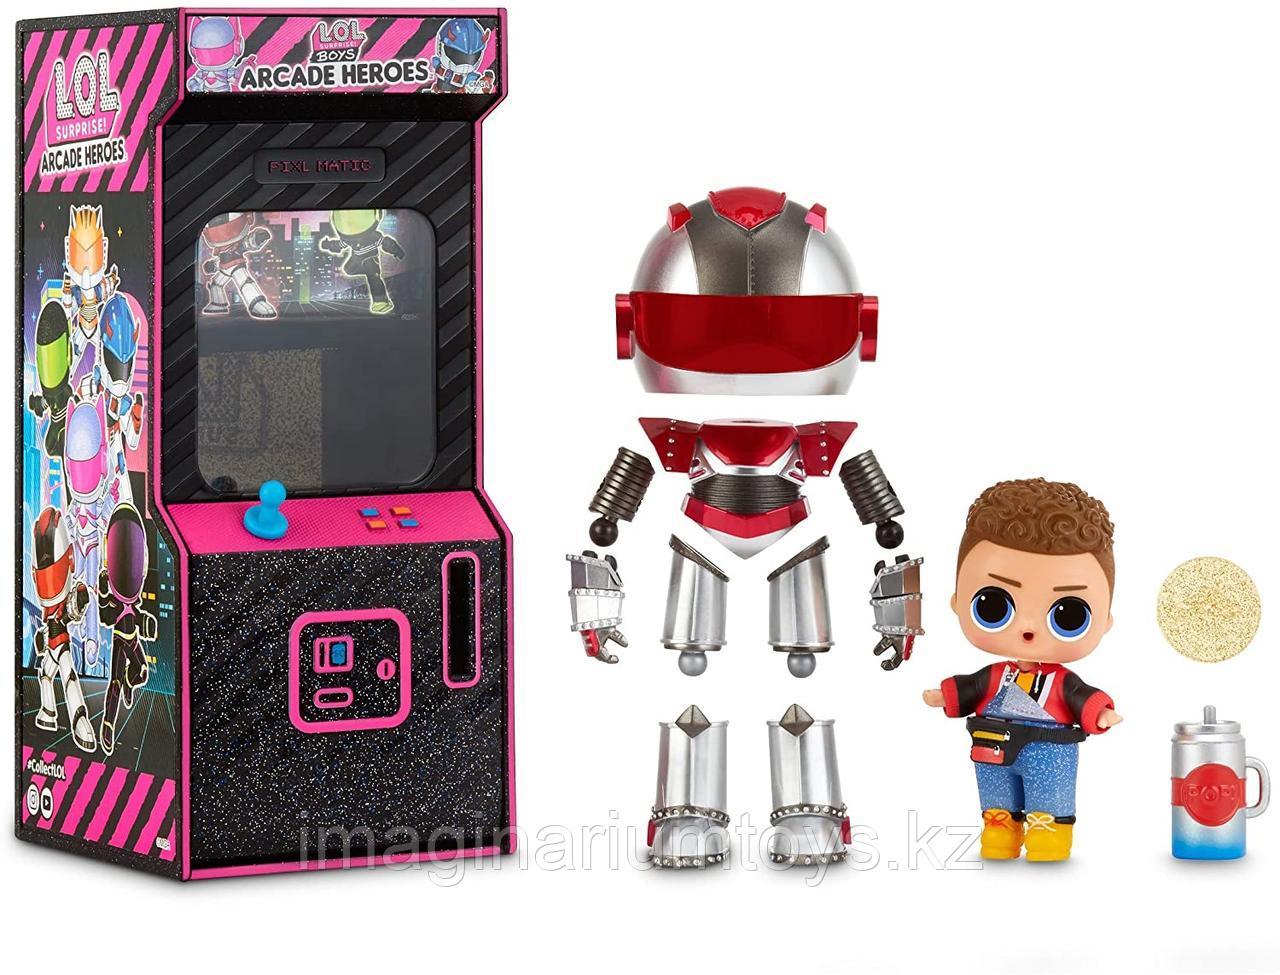 Кукла LOL Boys Arcade ЛОЛ супергерои Аркады